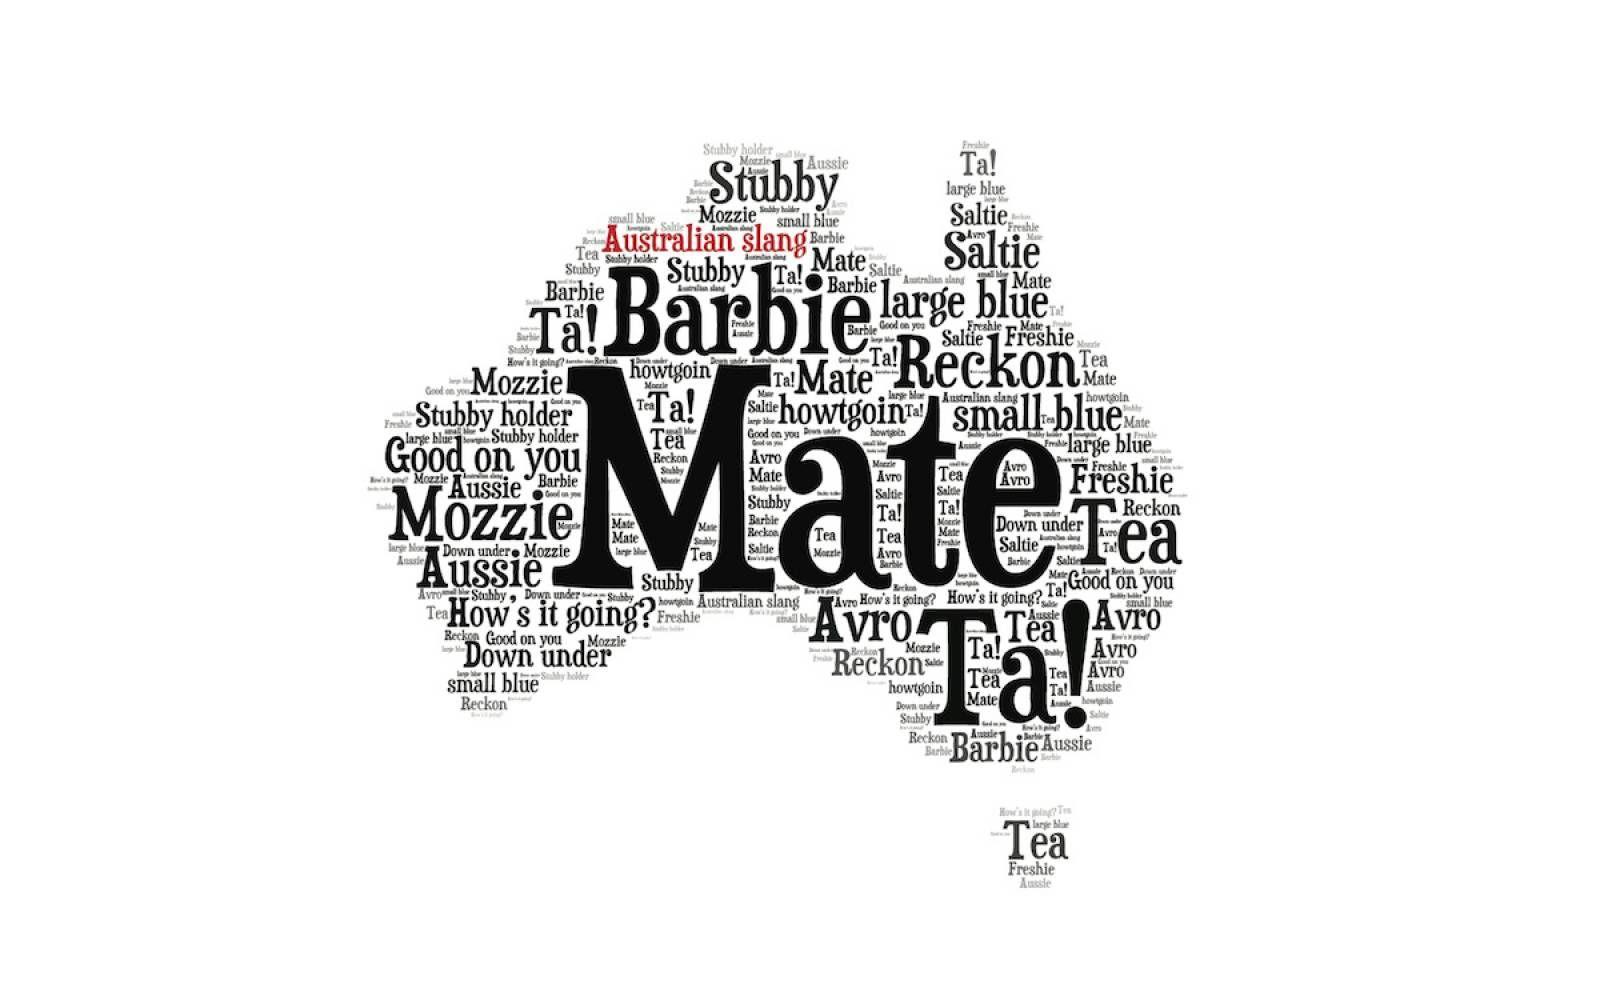 Over 100 australian slang terms phrases australian slang and a beginners guide to speaking australian aussie slang kristyandbryce Gallery